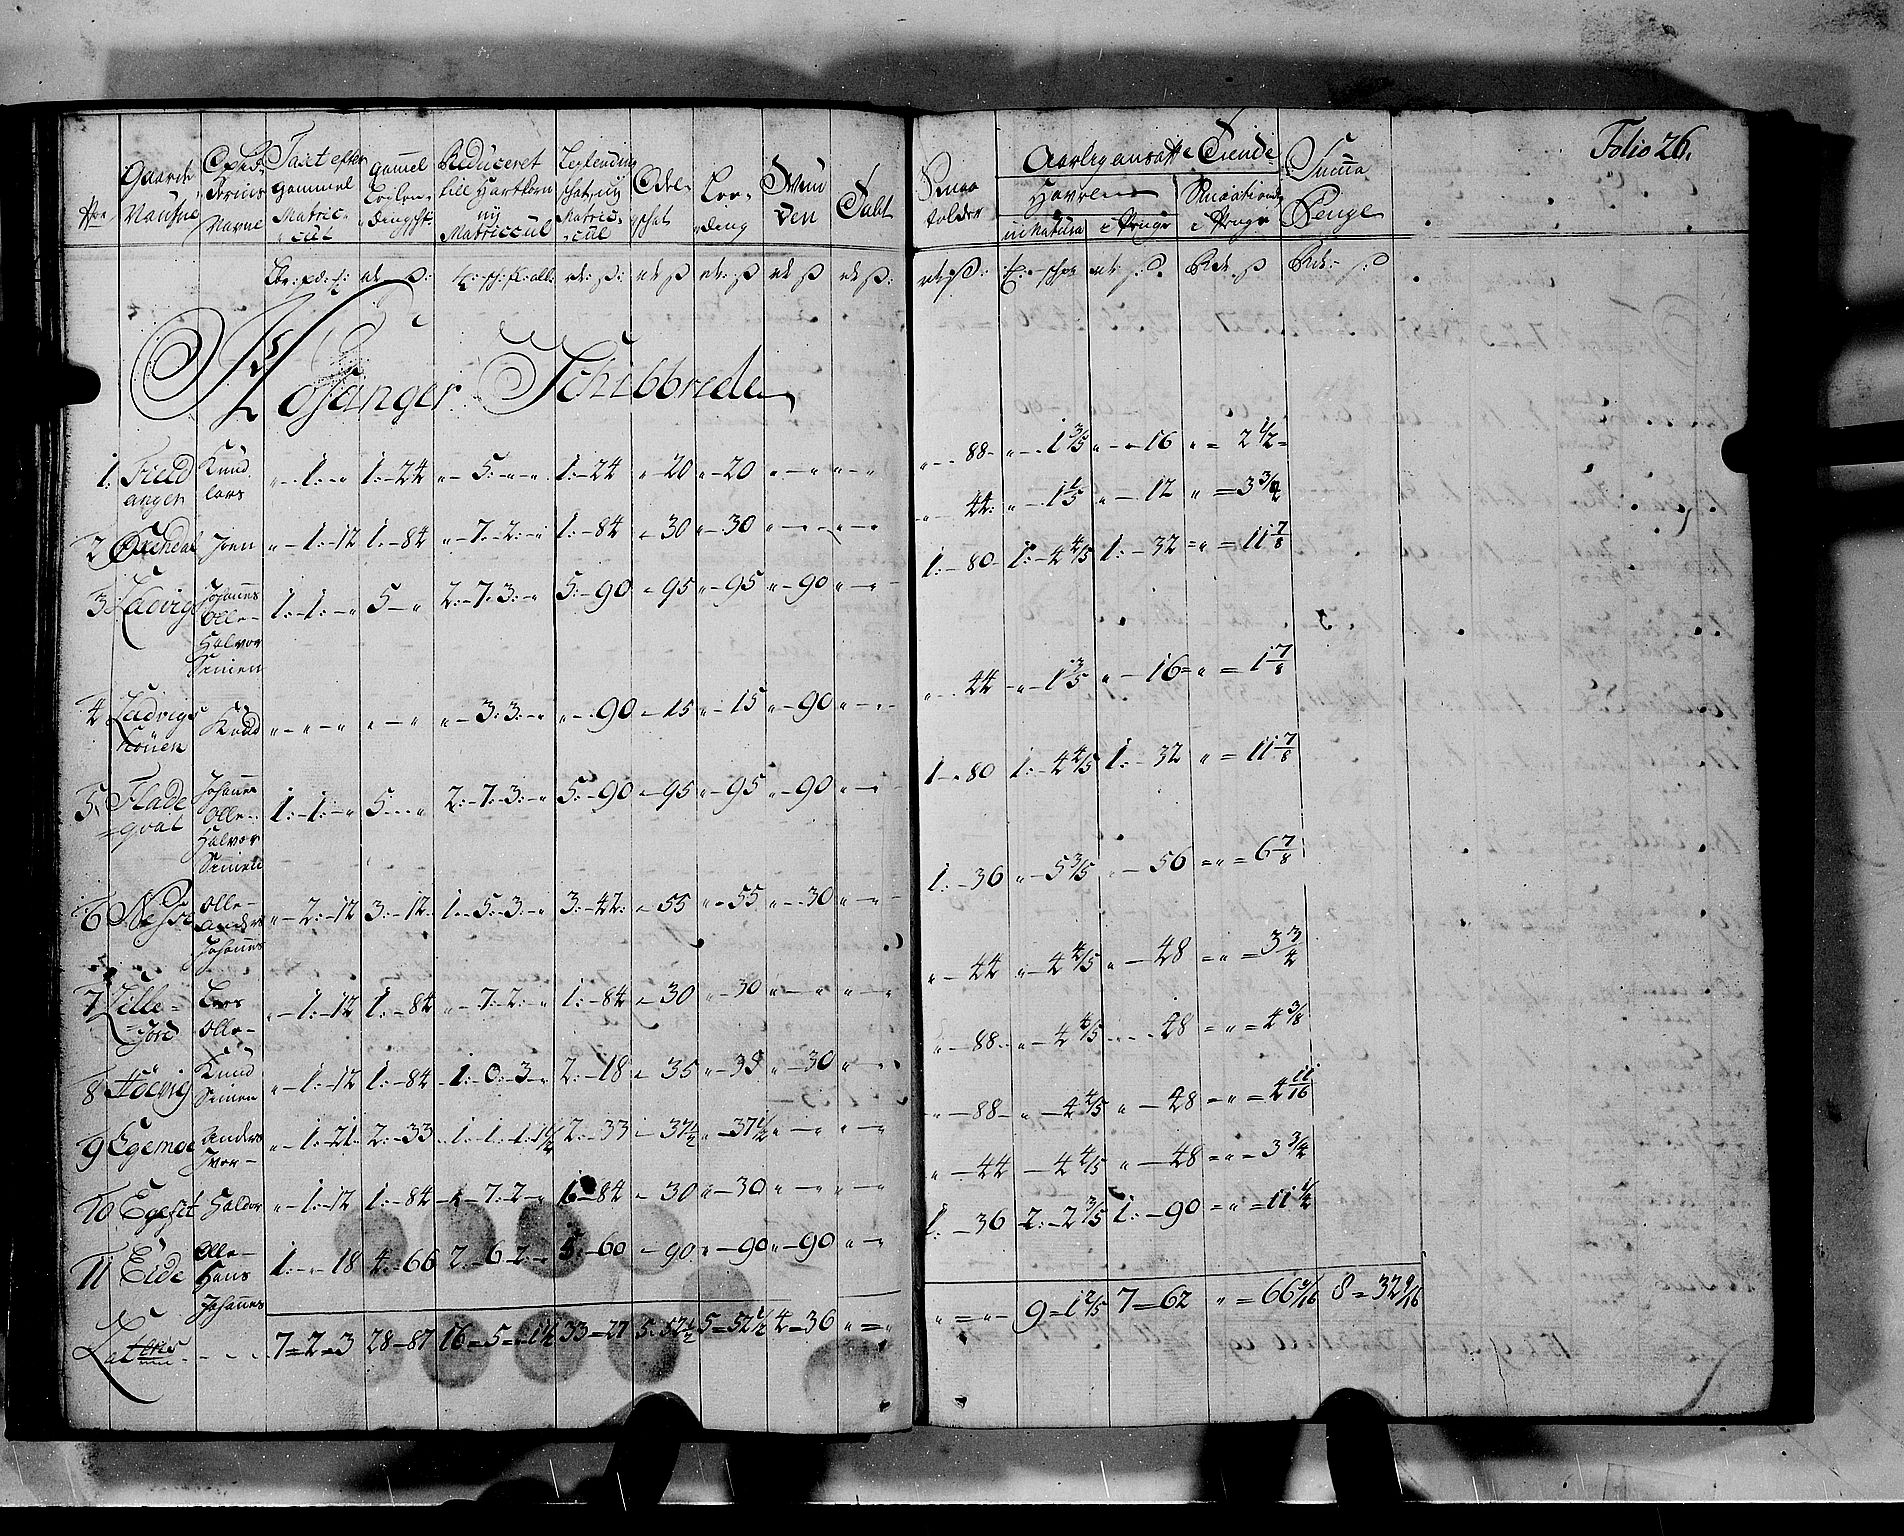 RA, Rentekammeret inntil 1814, Realistisk ordnet avdeling, N/Nb/Nbf/L0140: Nordhordland matrikkelprotokoll, 1723, s. 25b-26a